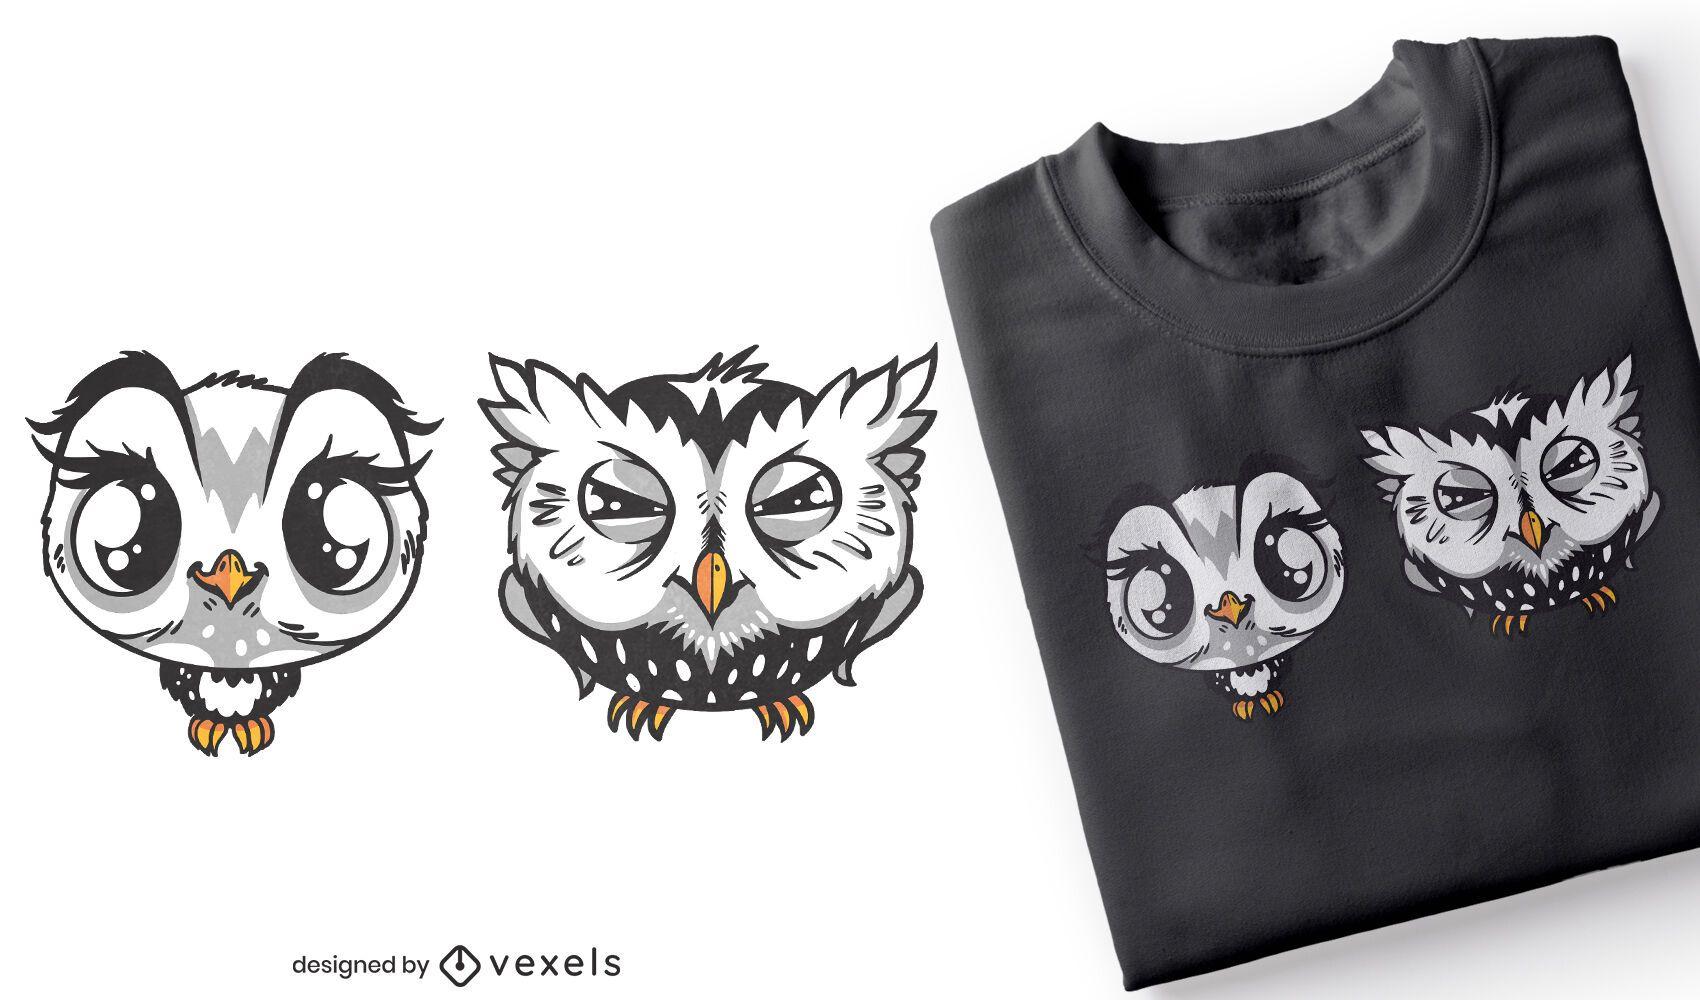 Cute and grumpy owls t-shirt design